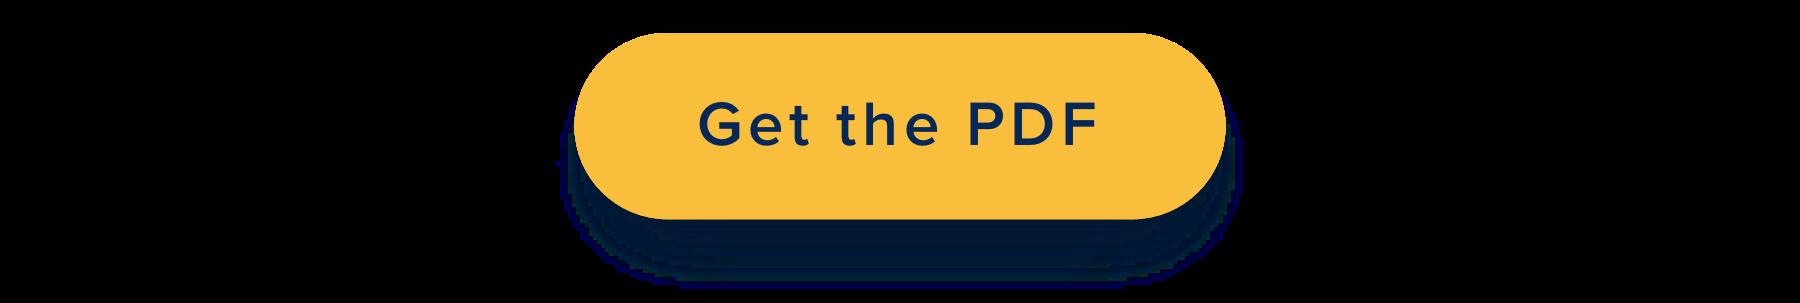 get the pdf